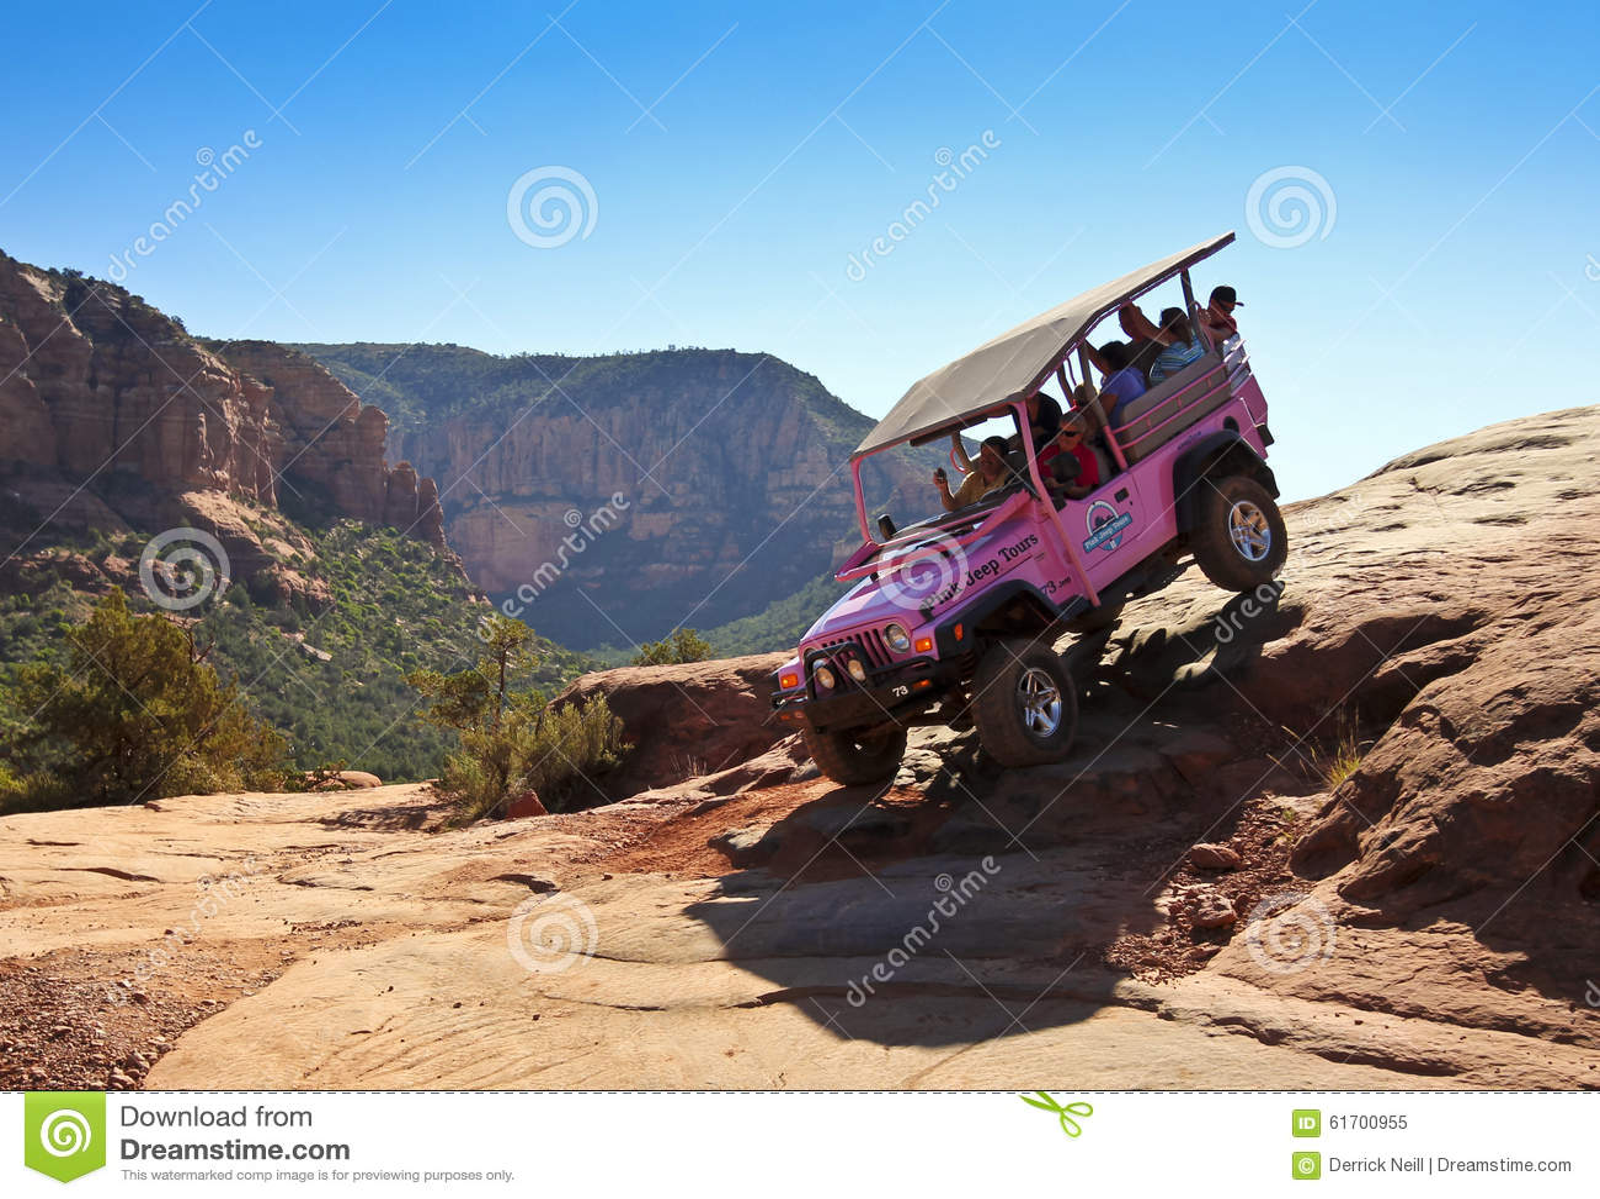 Arizona Rocks Tours